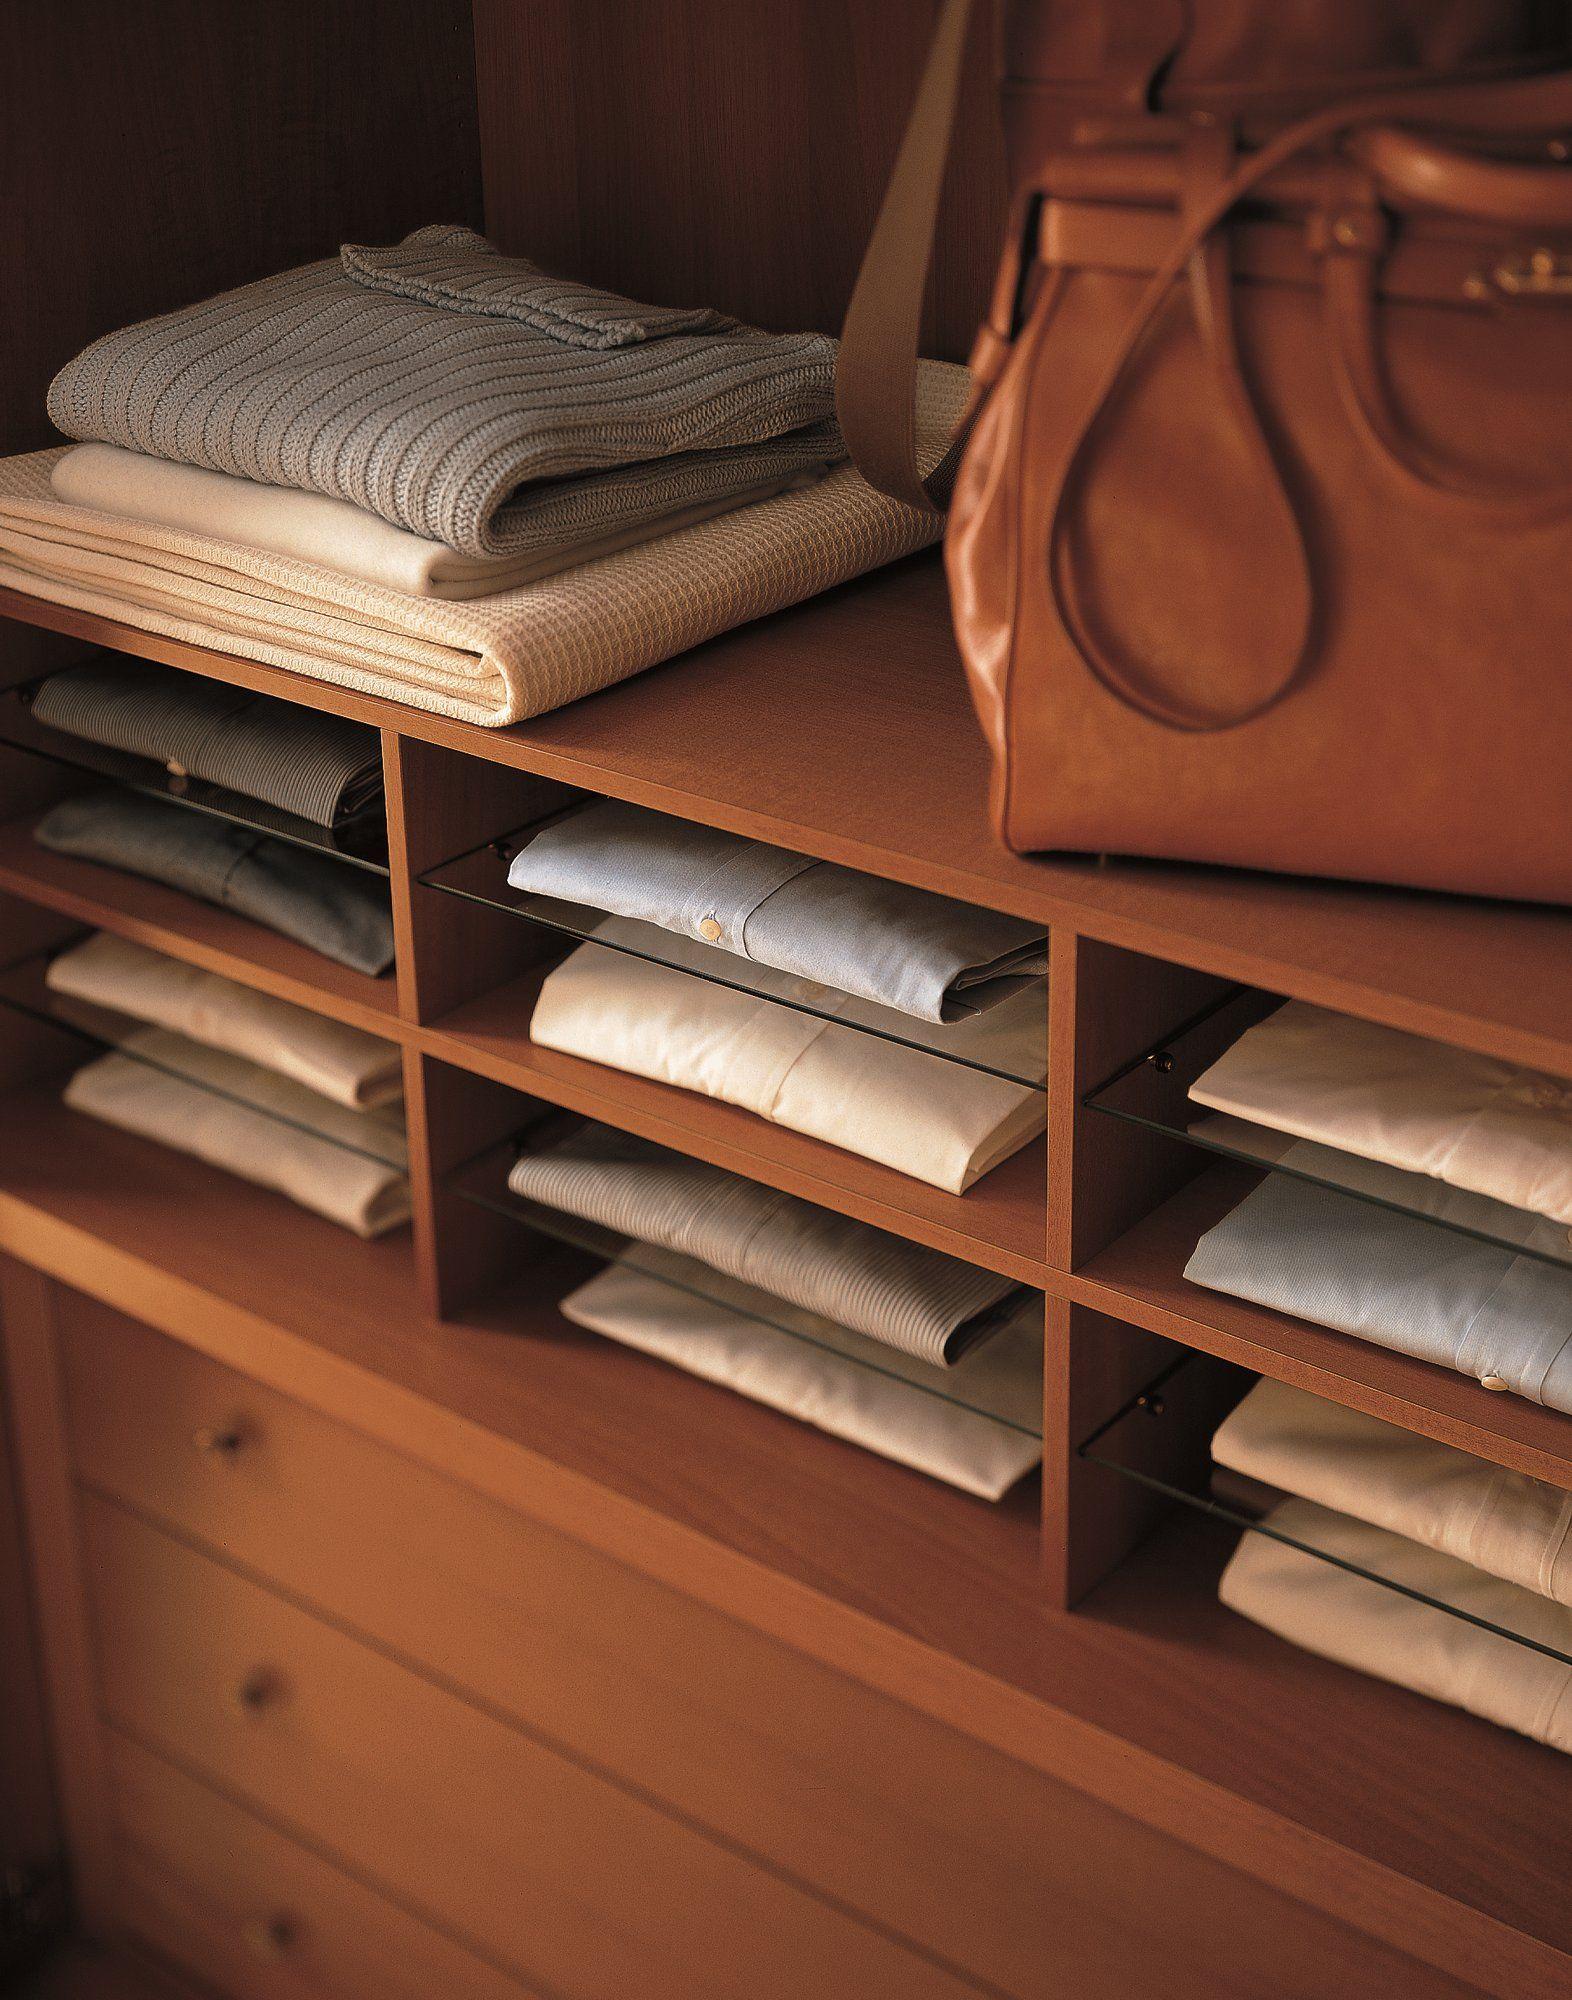 unico pont de lit by dall agnese design komma. Black Bedroom Furniture Sets. Home Design Ideas